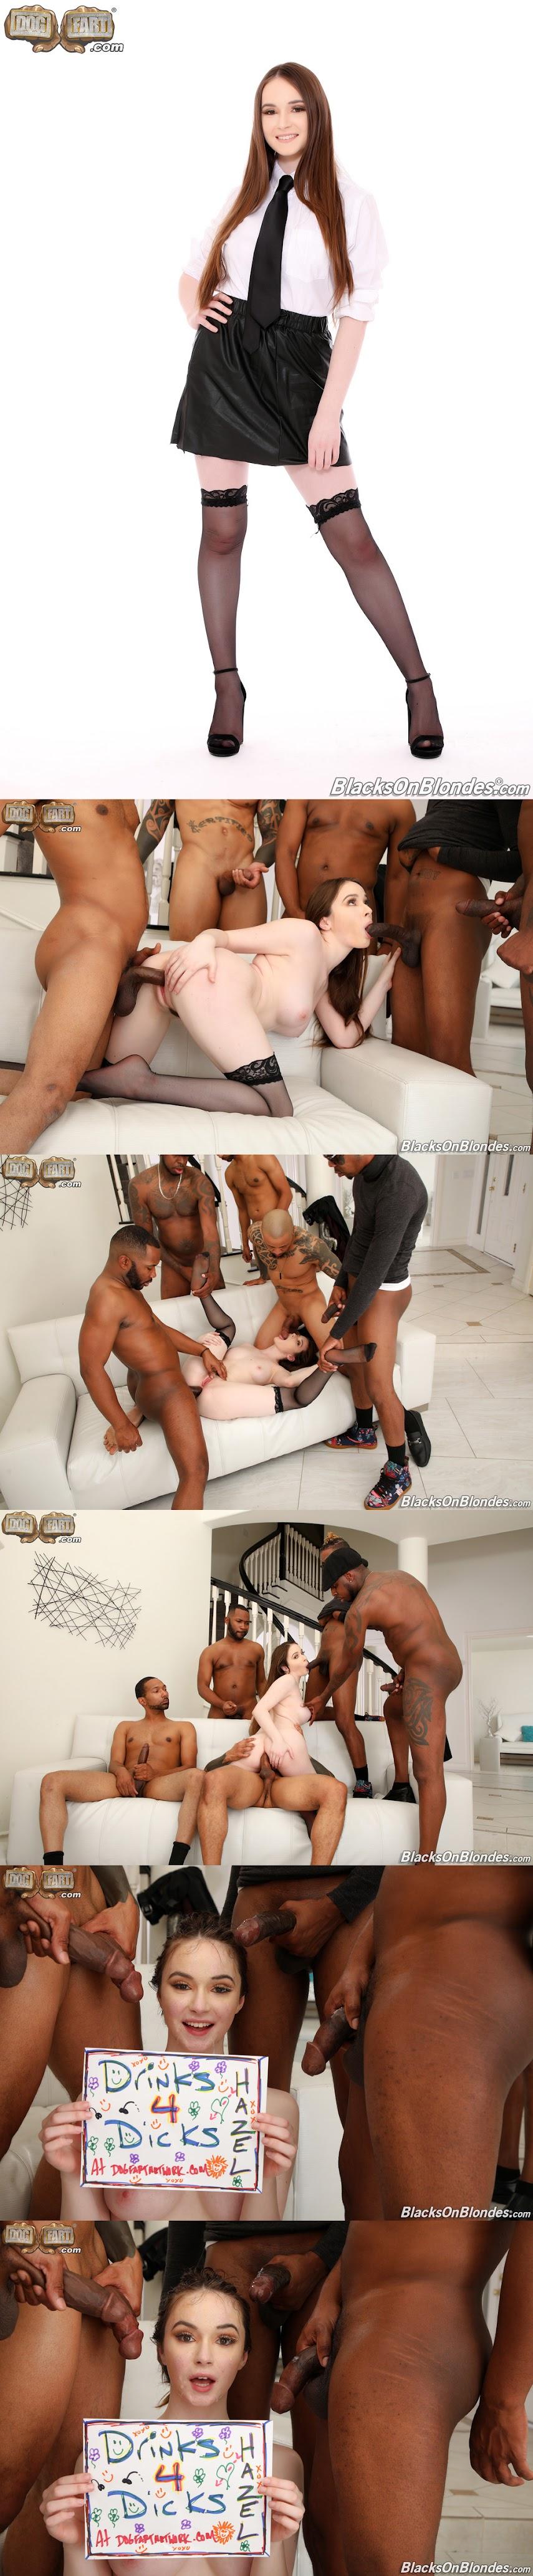 BOB 2021-06-15 Hazel Moore - Blacks on Blondes sexy girls image jav